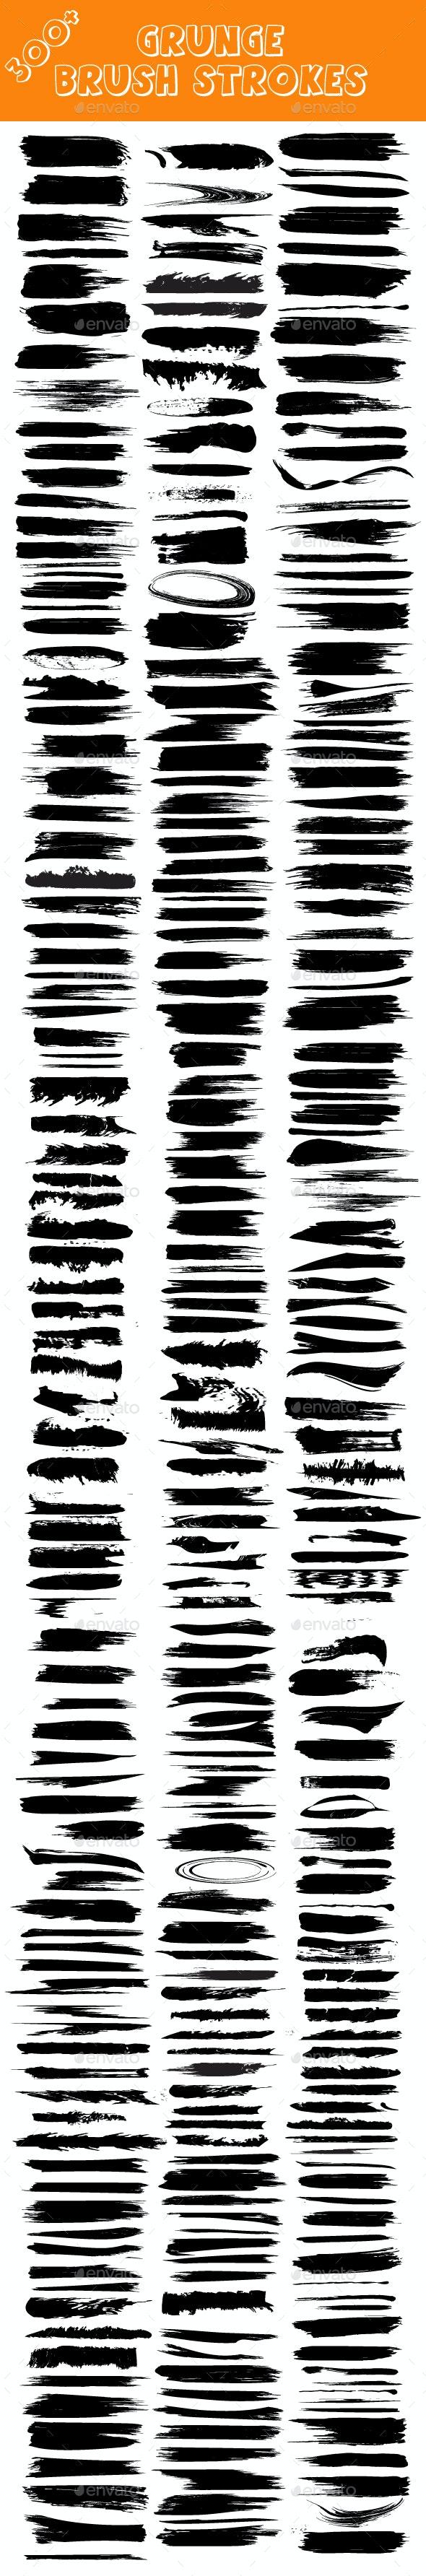 Set of Grunge Brush Strokes - Flourishes / Swirls Decorative